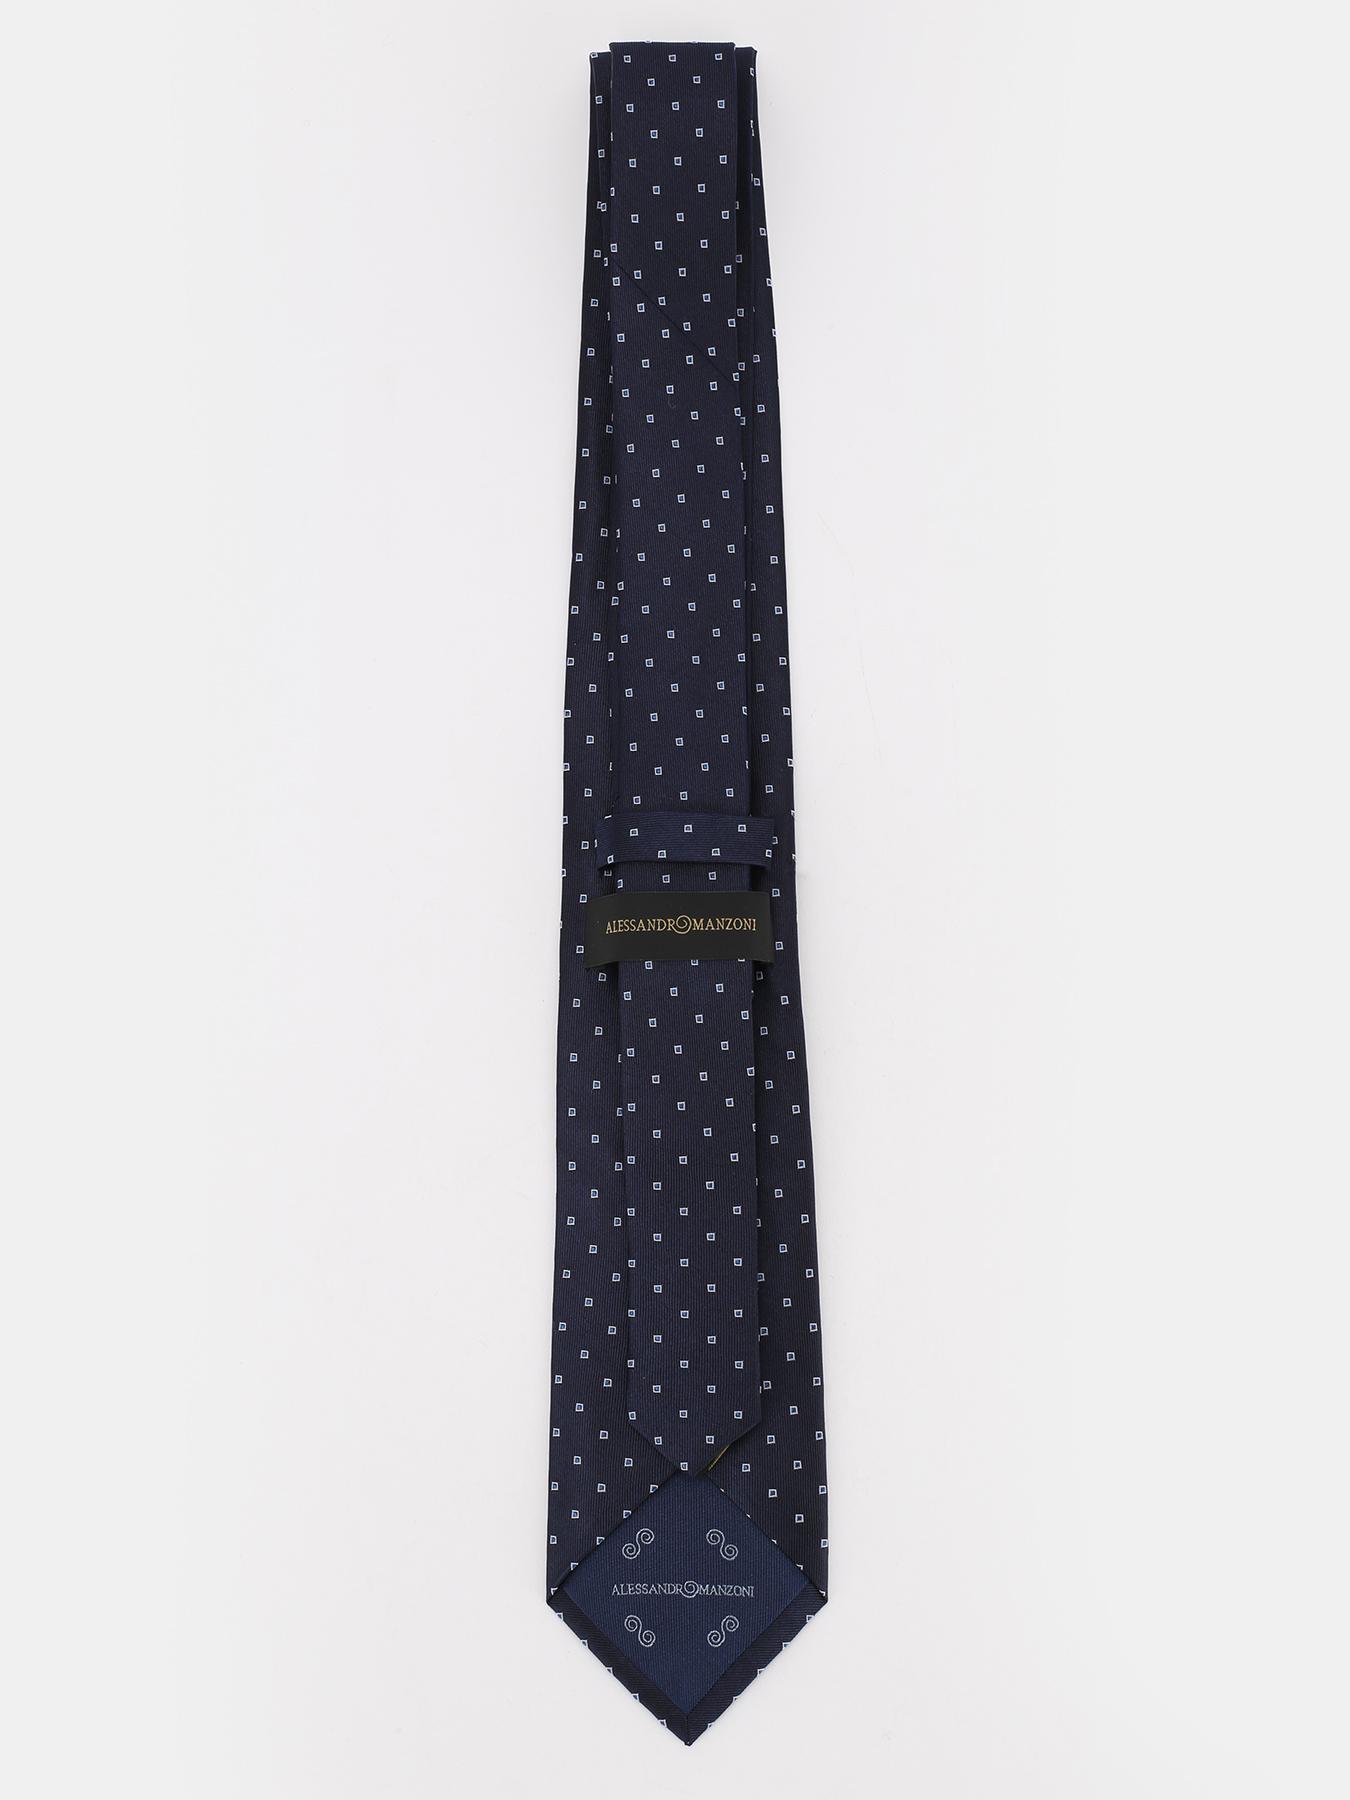 Alessandro Manzoni Шелковый галстук с узорами 324185-185 Фото 2